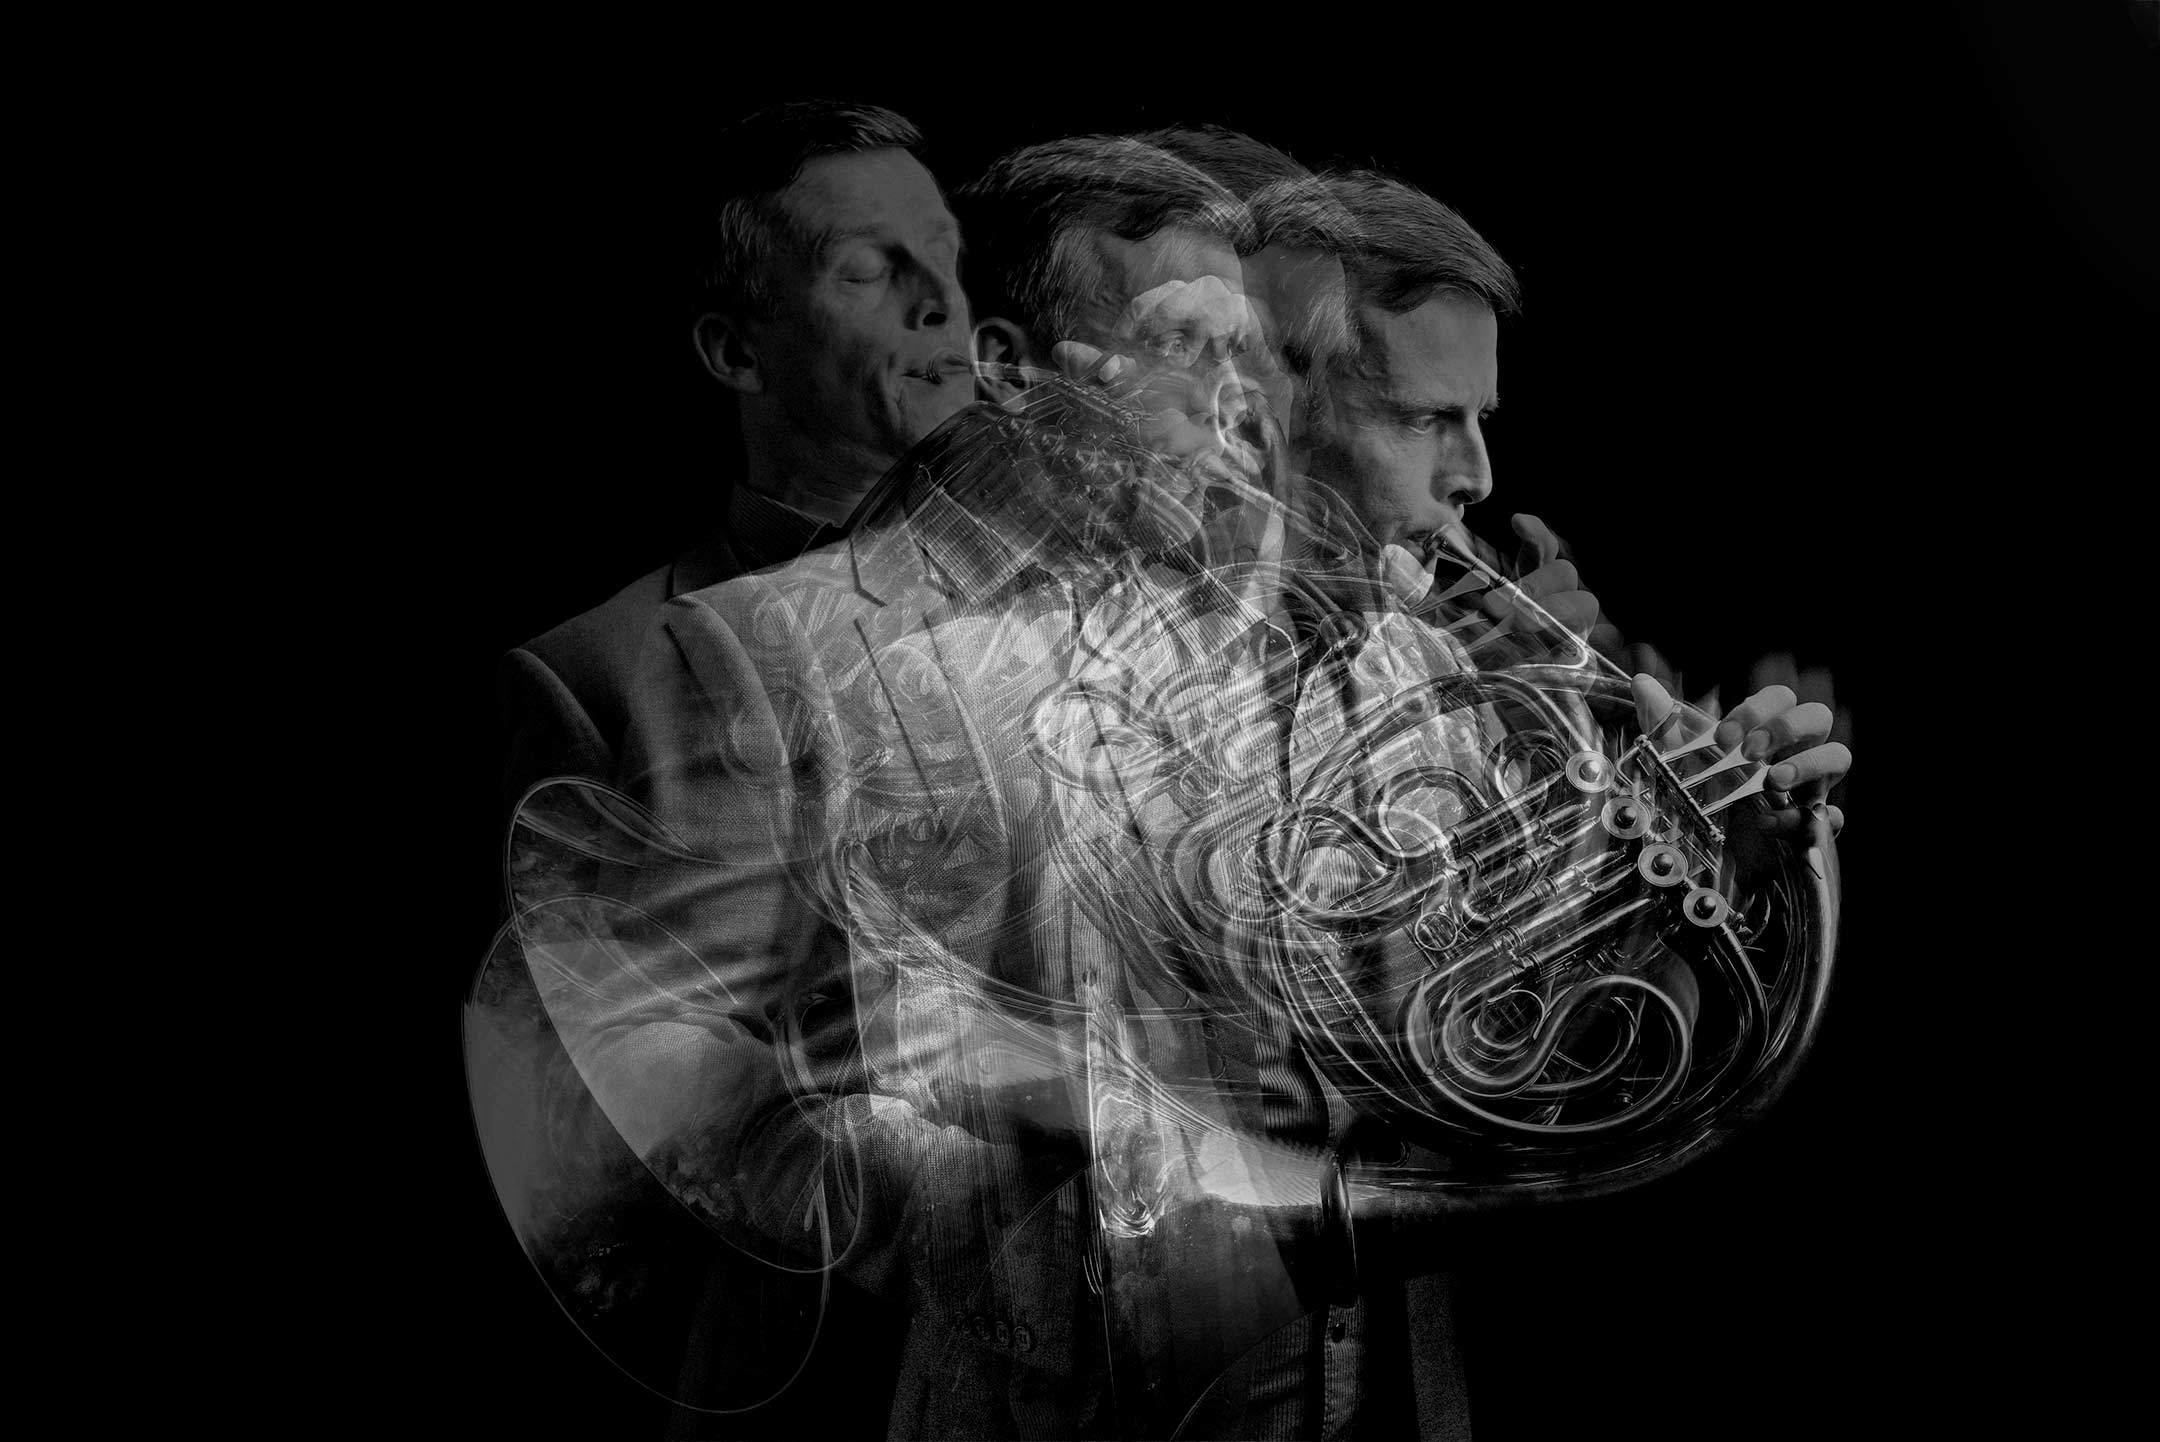 french_horn_musician_symphony_brandon_patoc.jpg